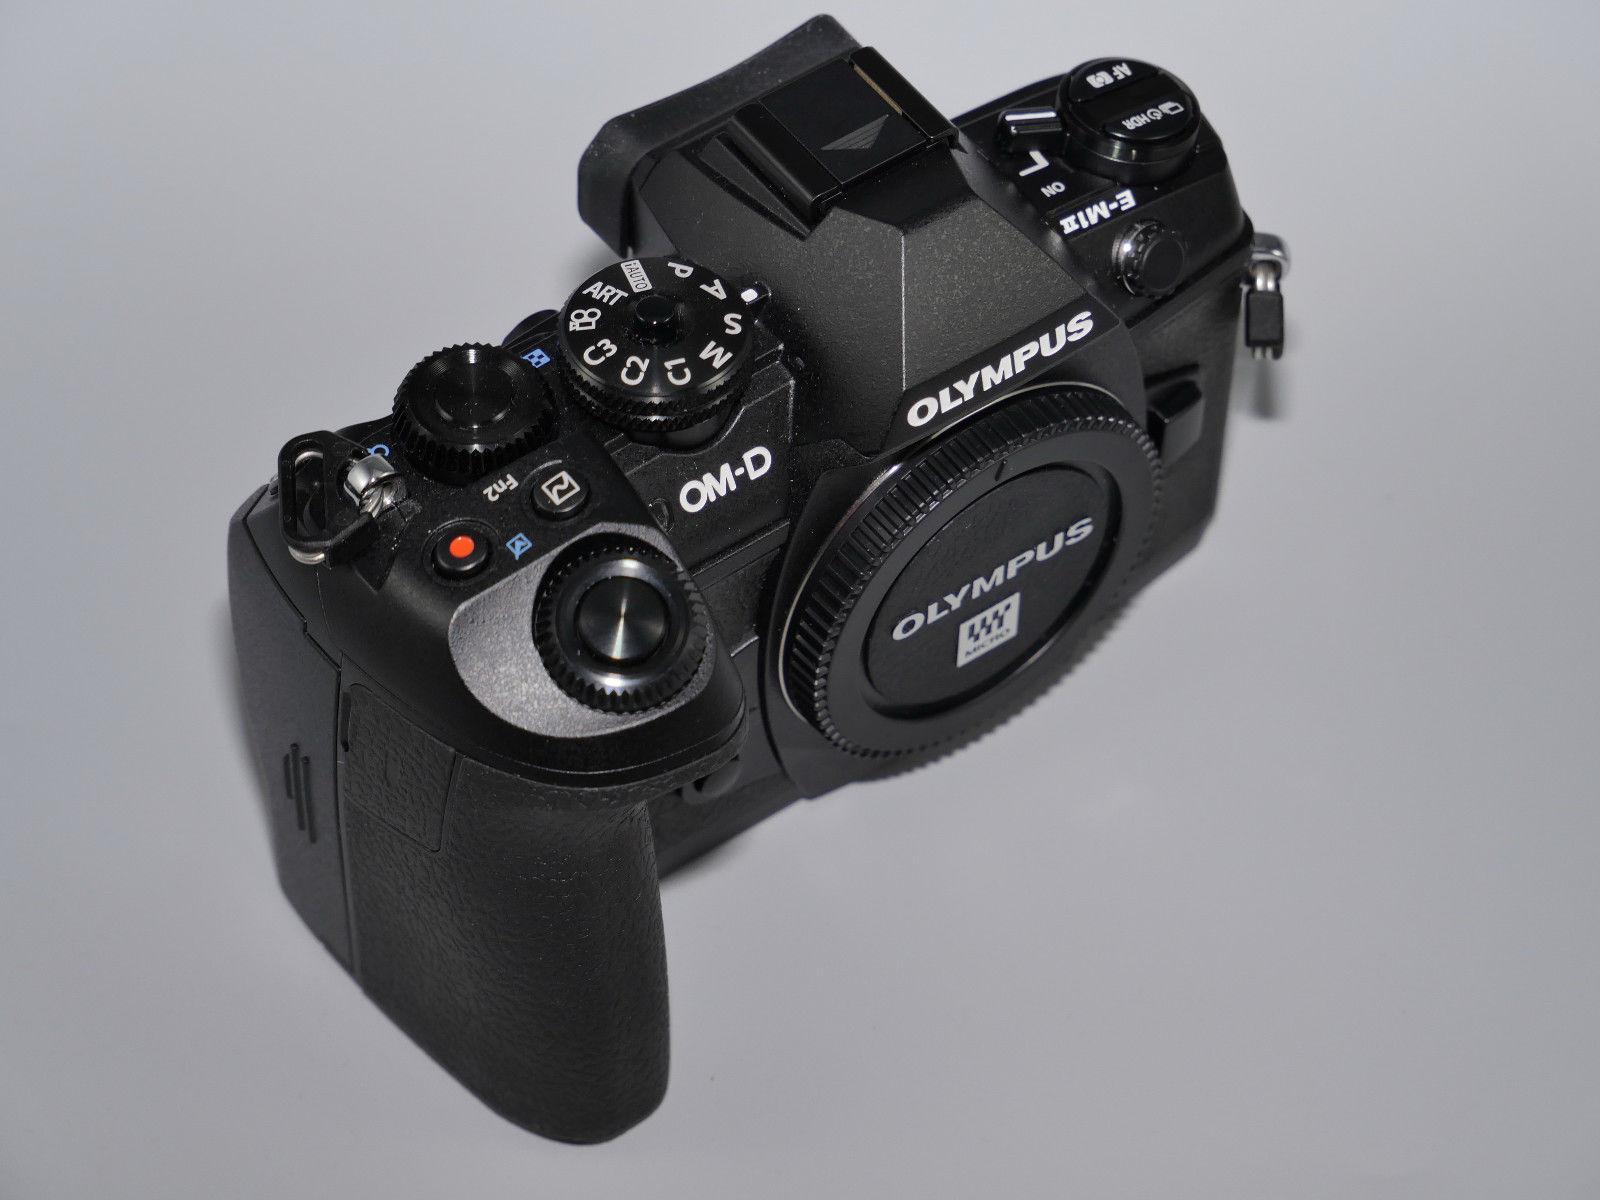 Olympus OM-D E-M1 Mark II Systemkamera